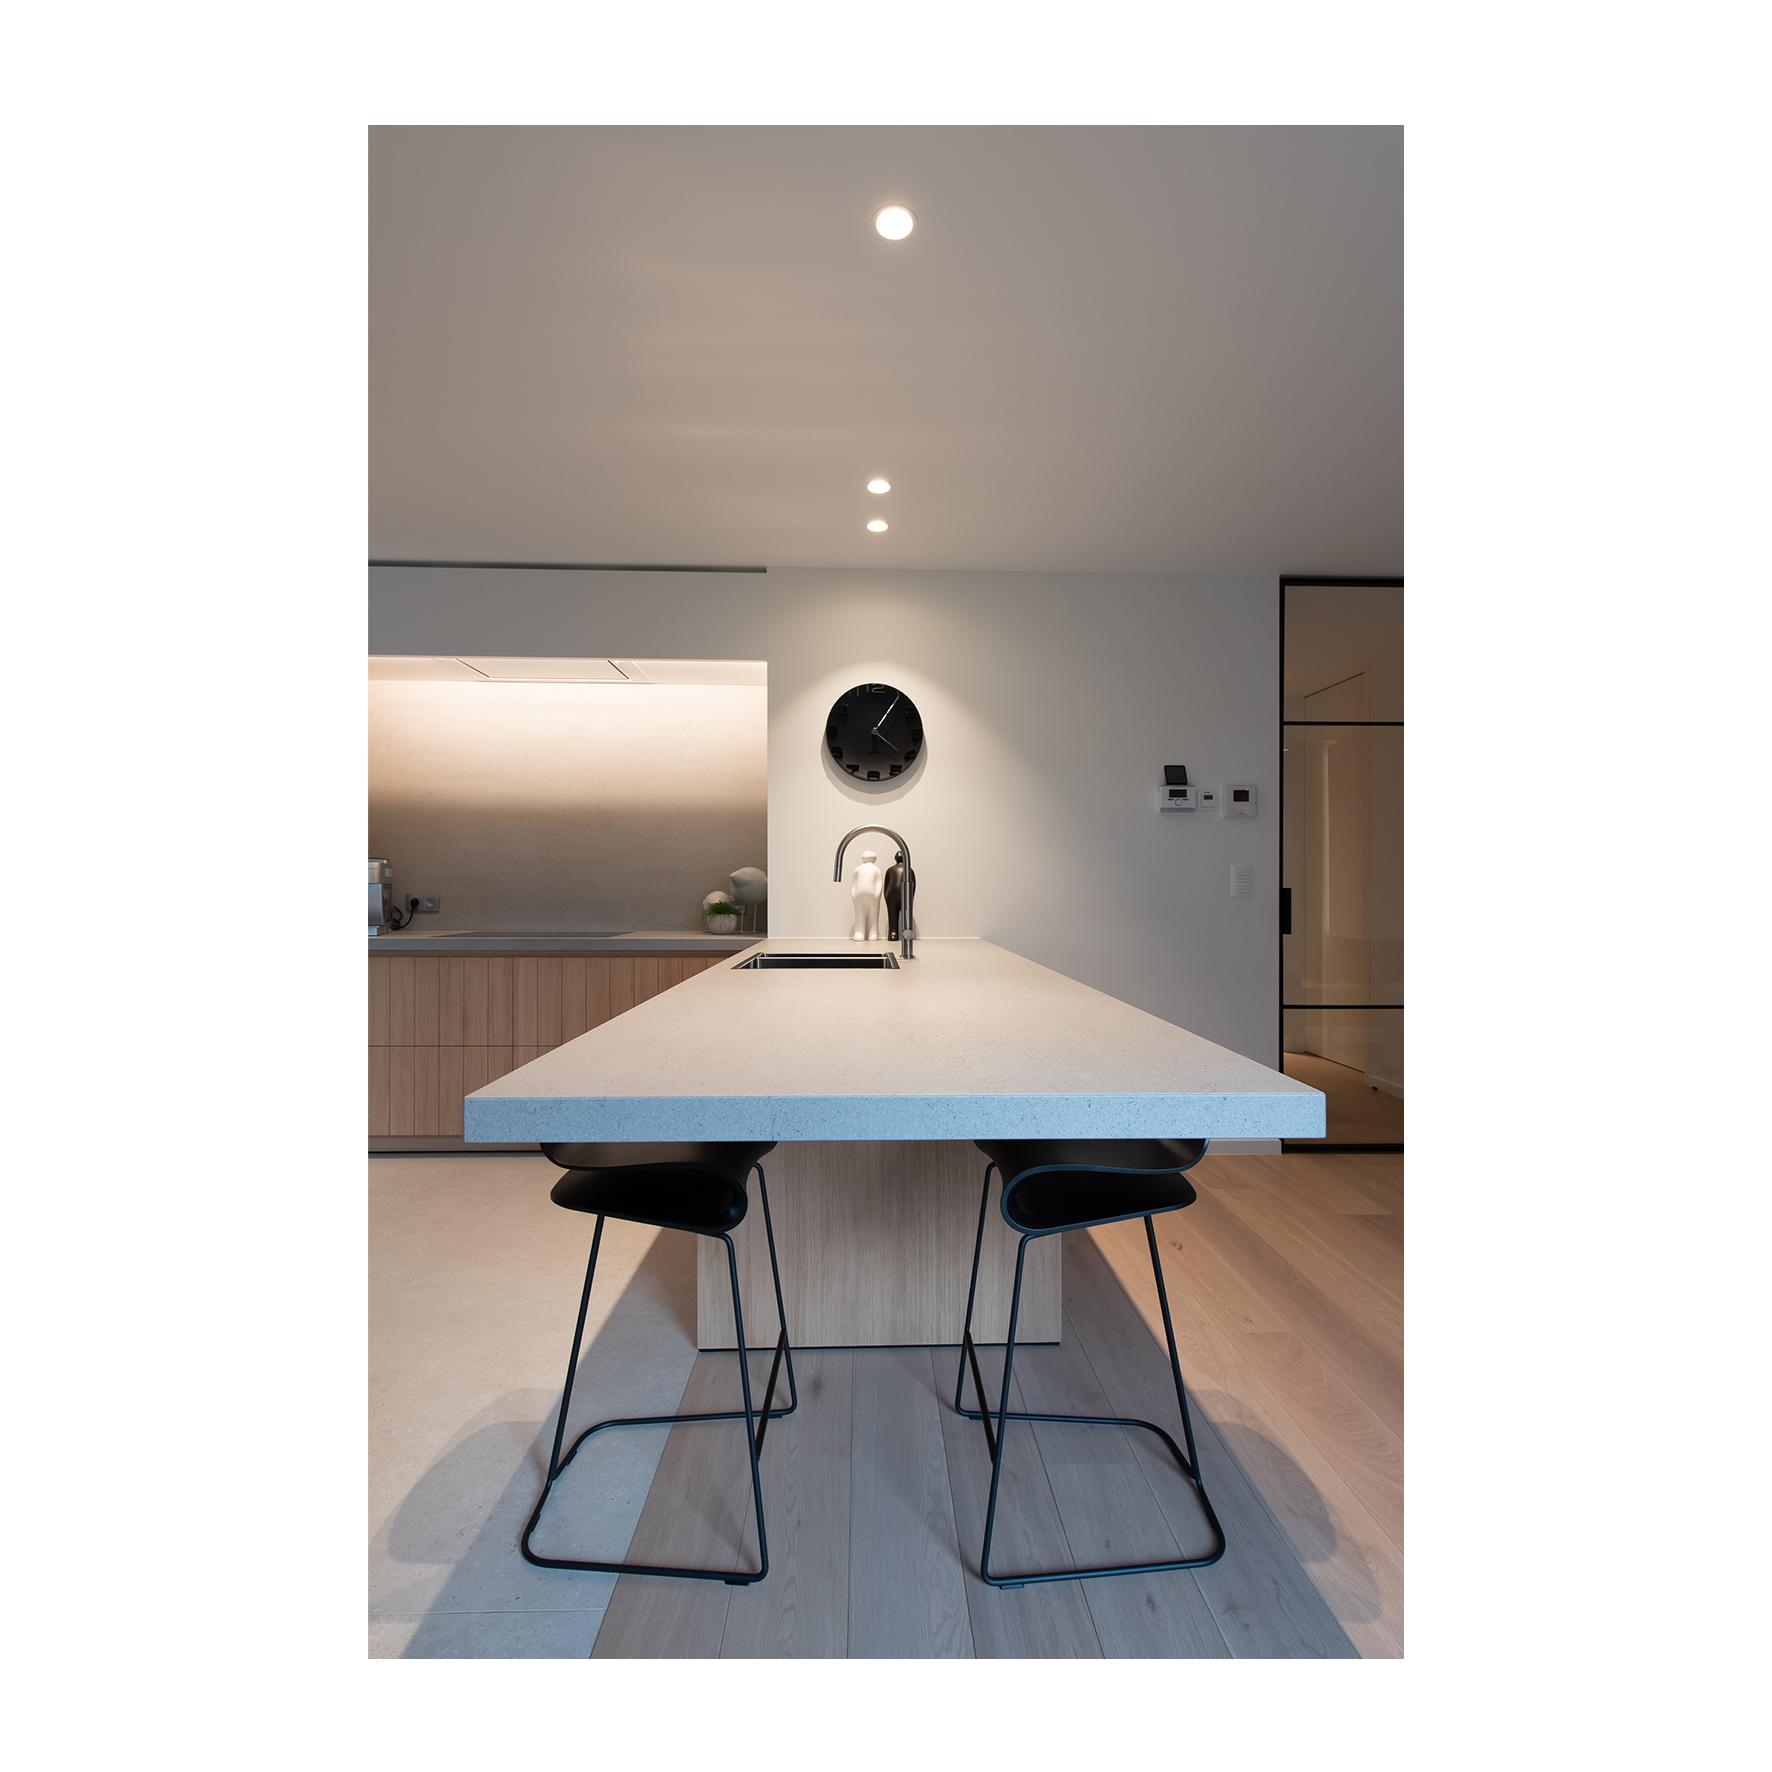 Interieurfotografie - In-Lijn Interieurarchitectuur